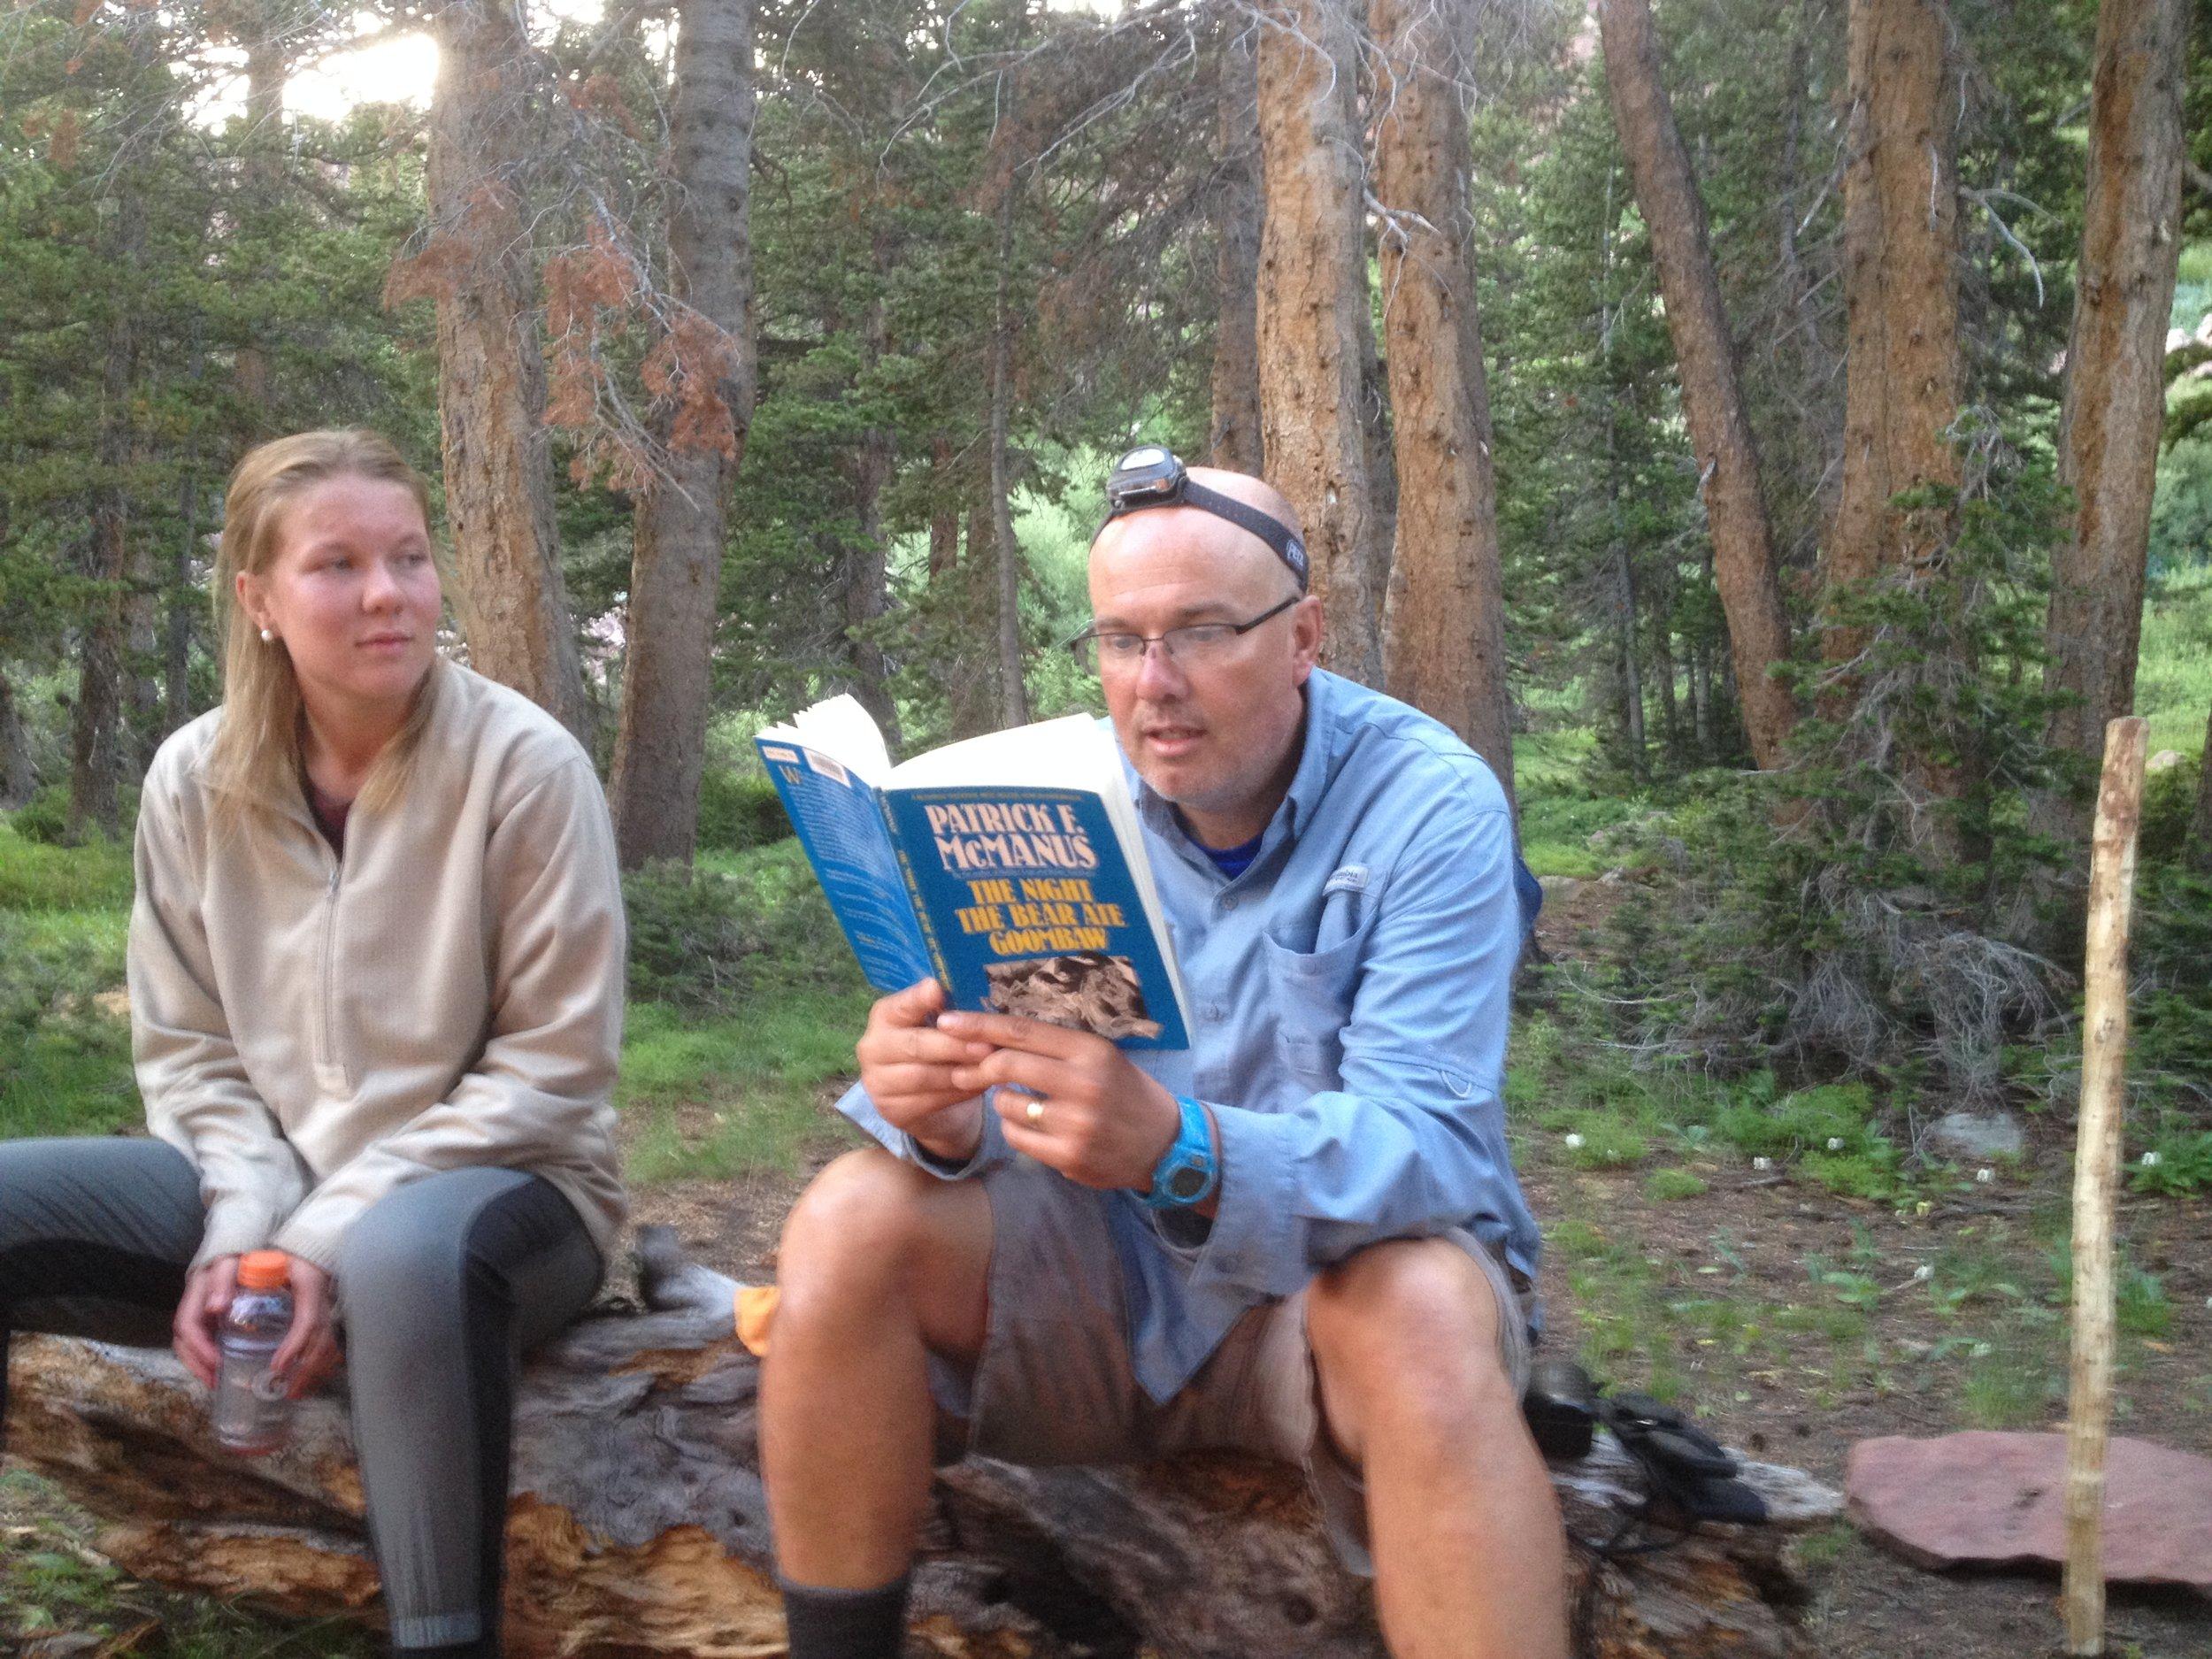 Orem headache clinic Ledge Lake book reading